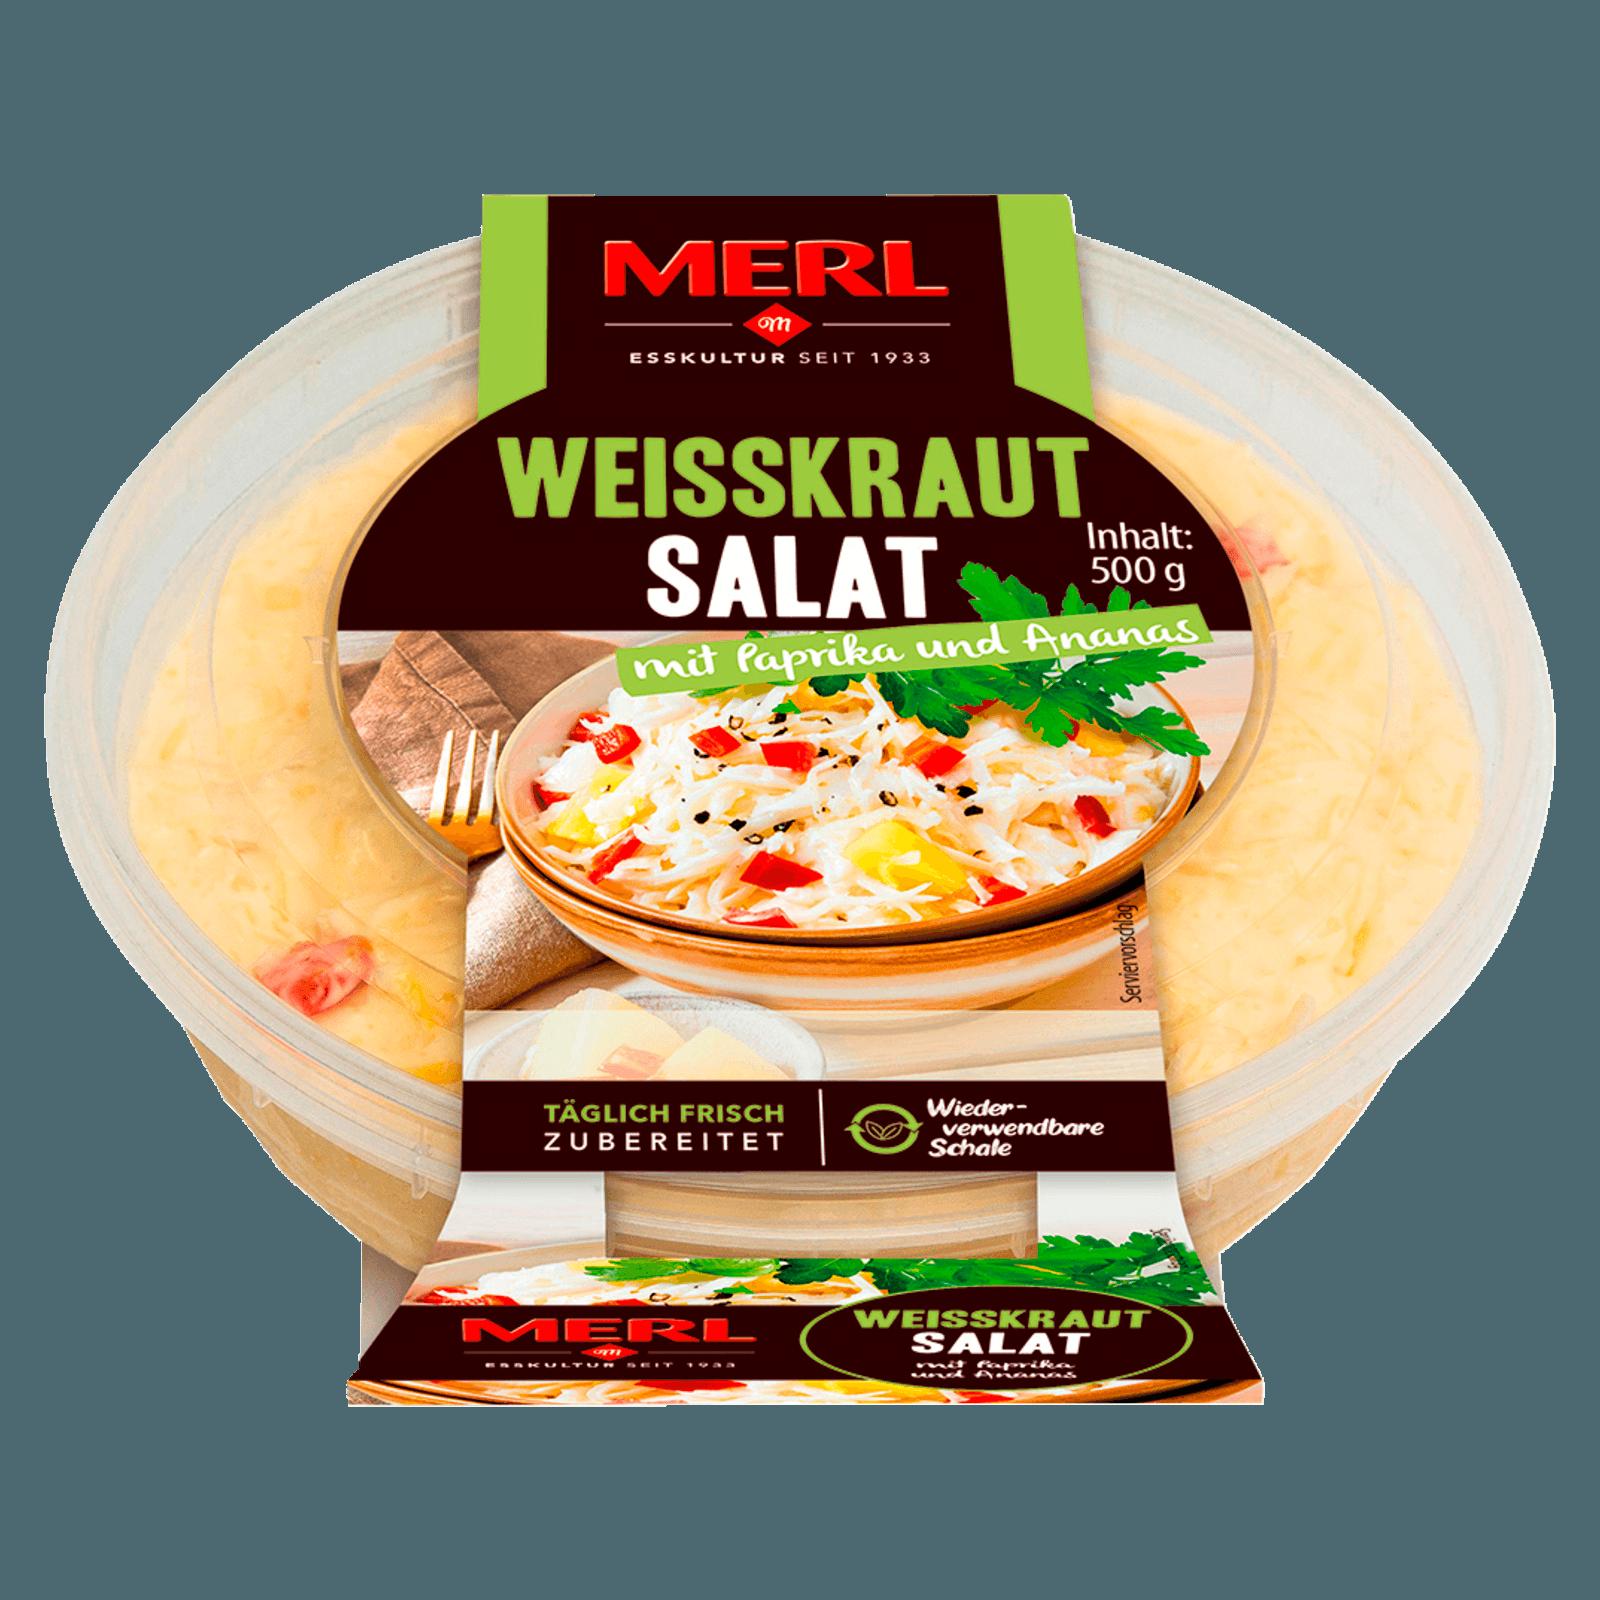 Merl Weißkrautsalat 500g